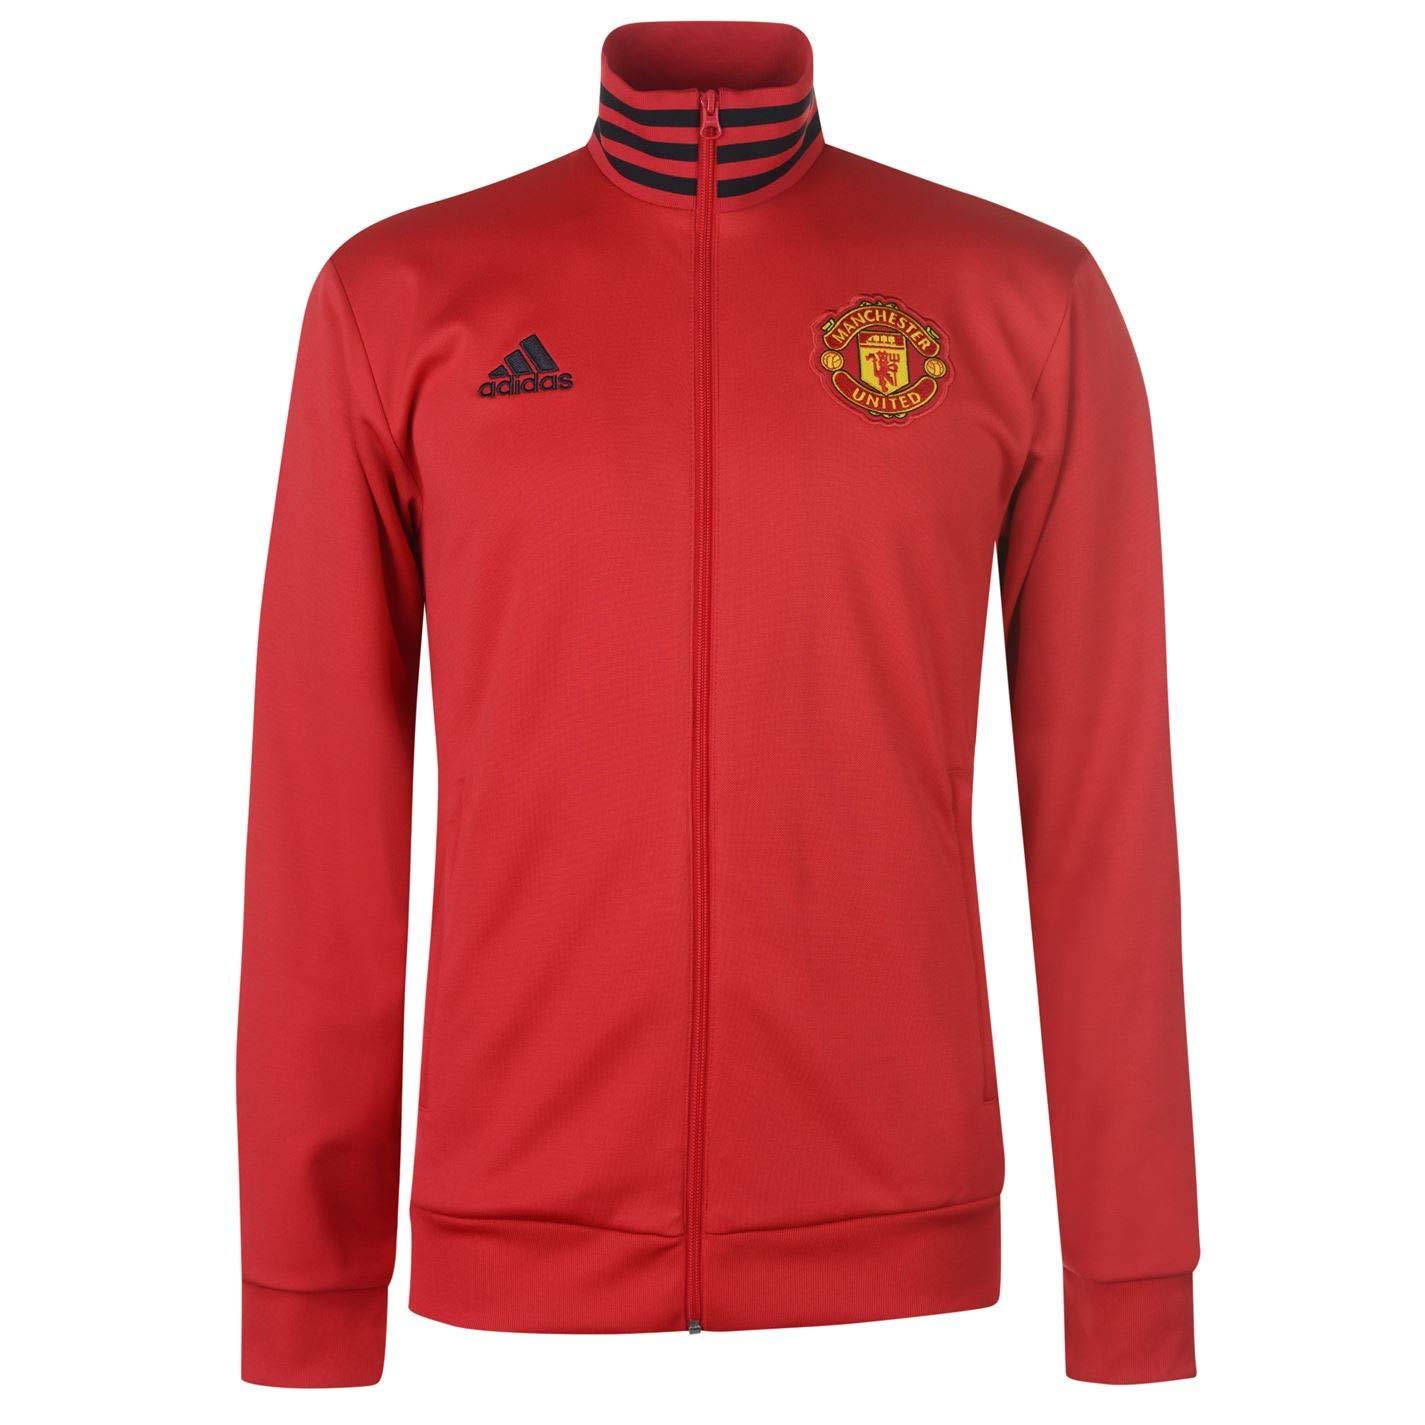 ADIDAS Herren Manchester United 3s Track Top Trainingsjacke